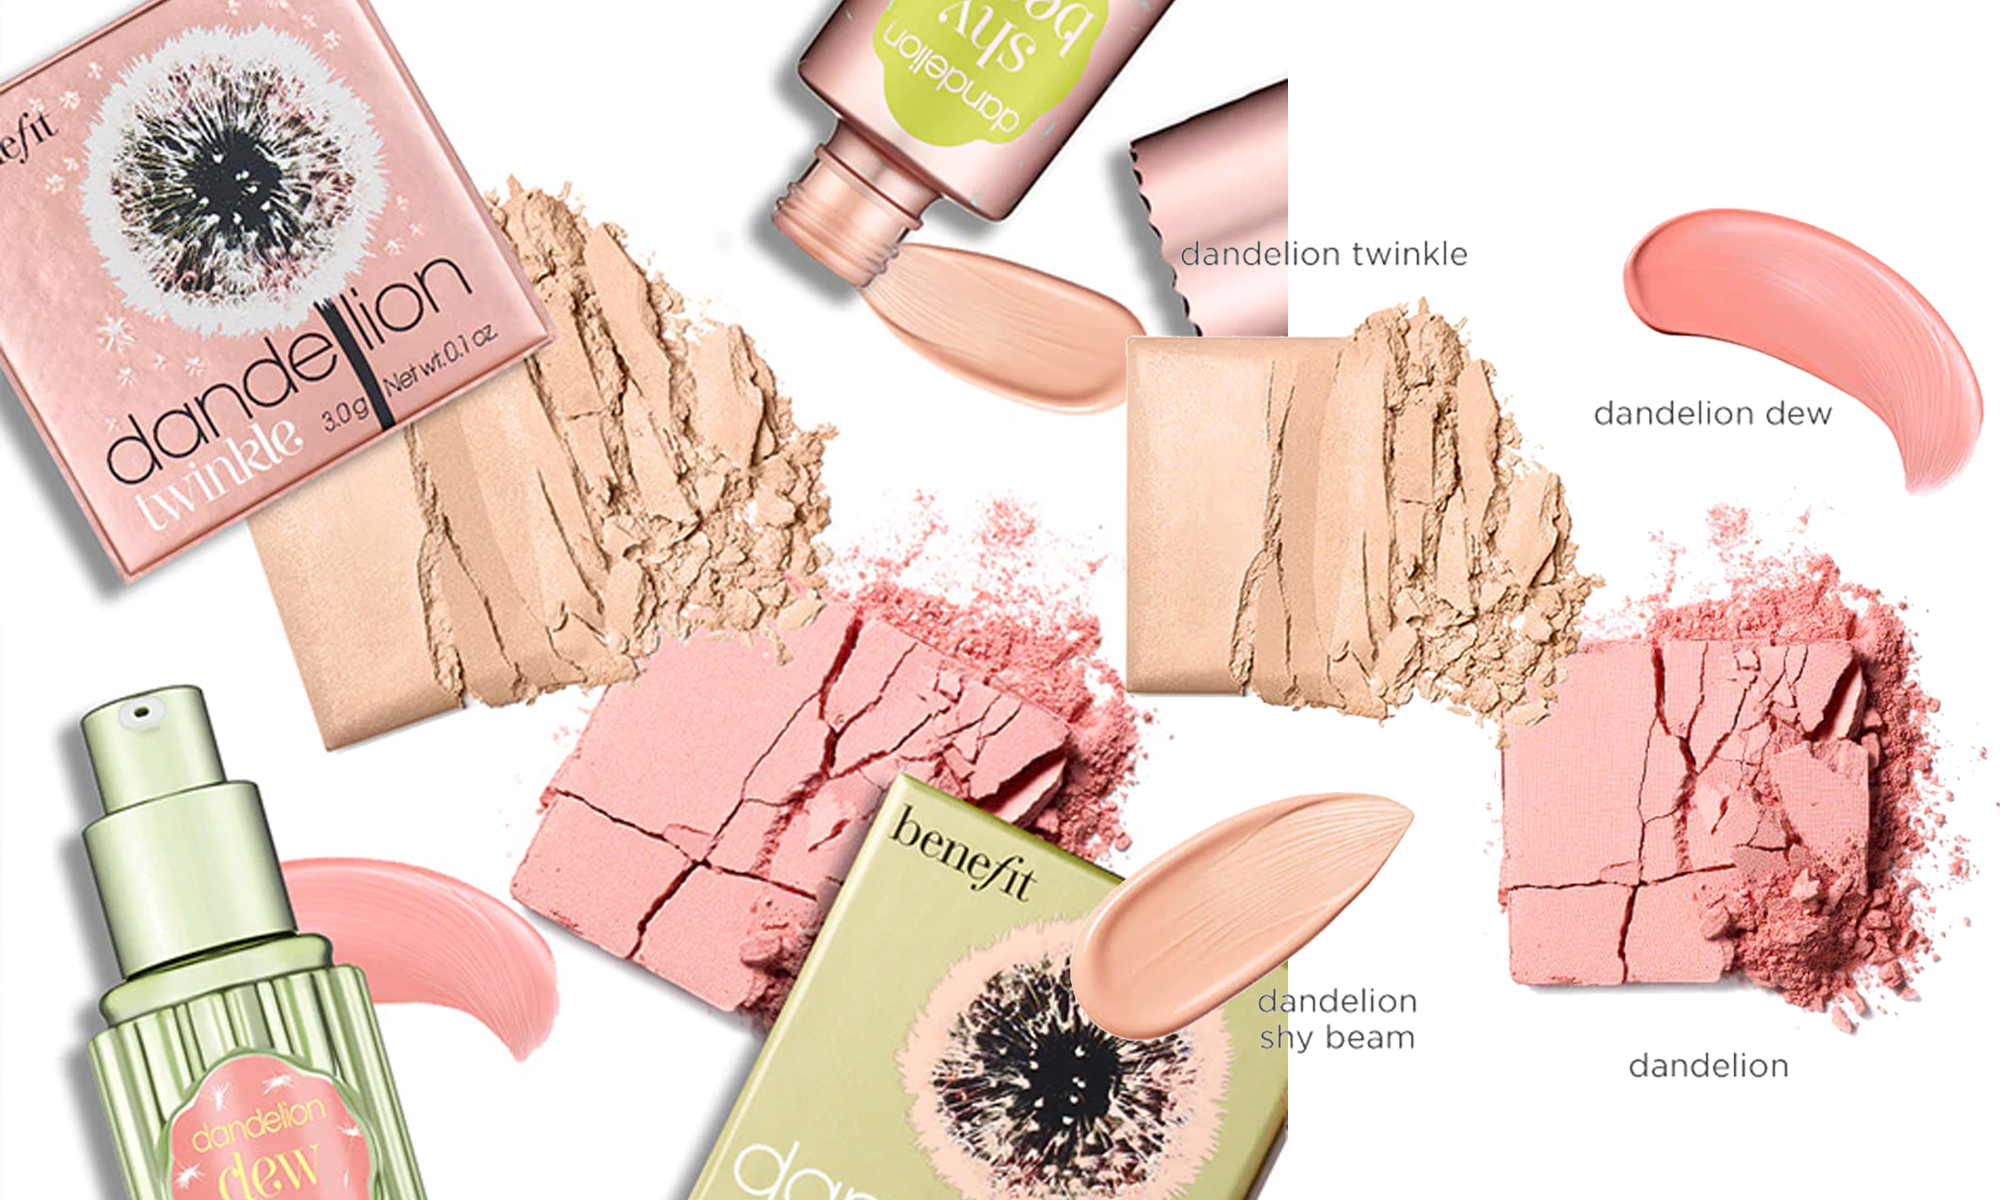 Images via Benefit Cosmetics